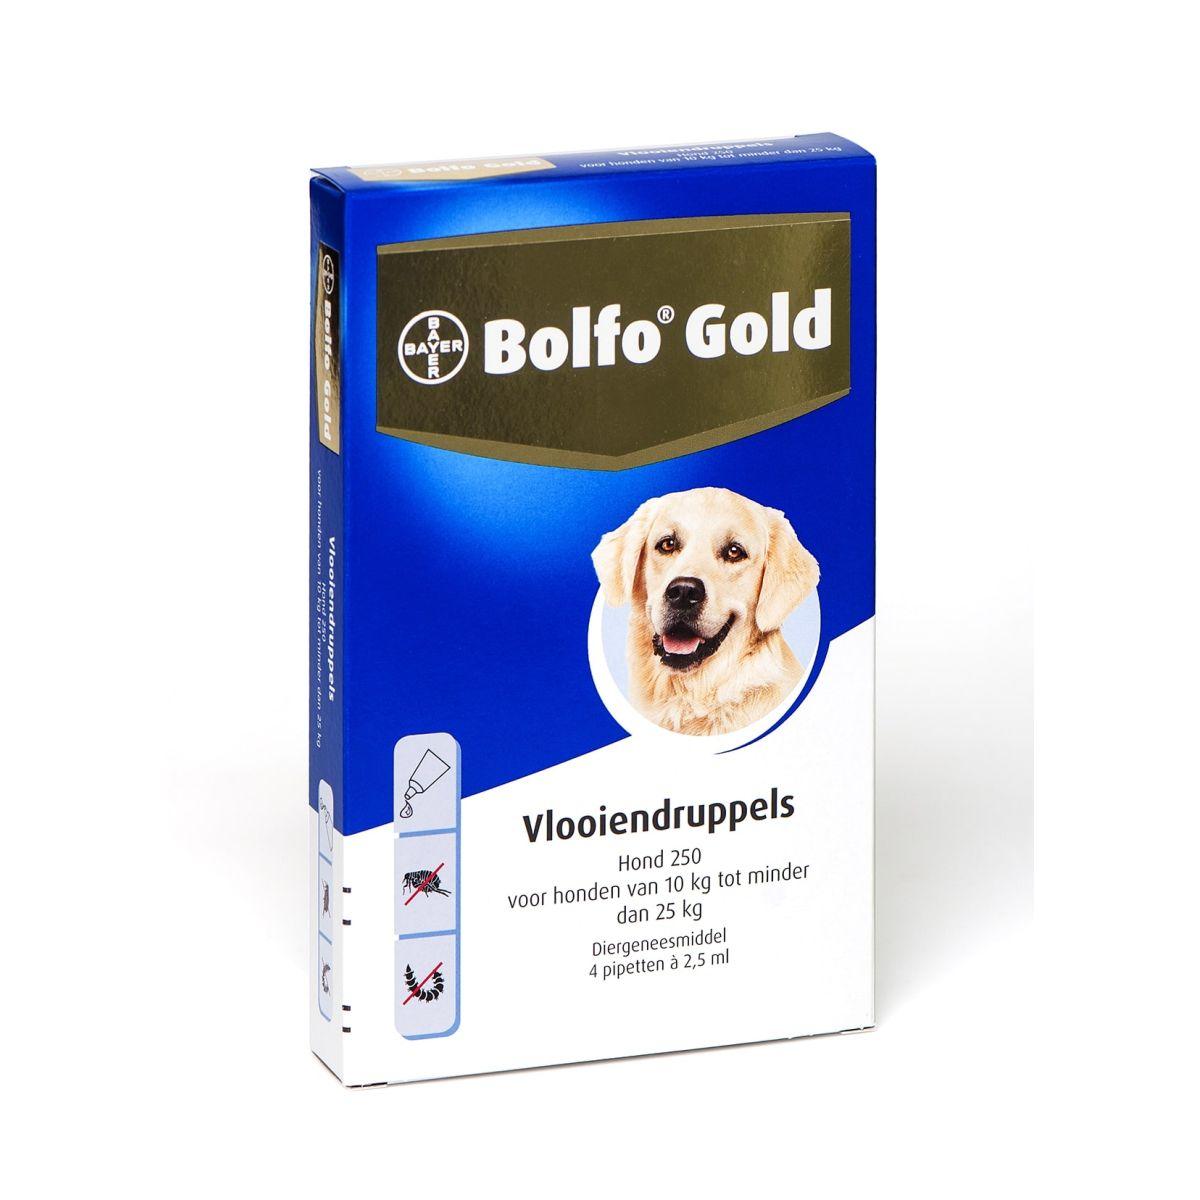 BA BOLFO GOLD HOND 250 4PIP 00001